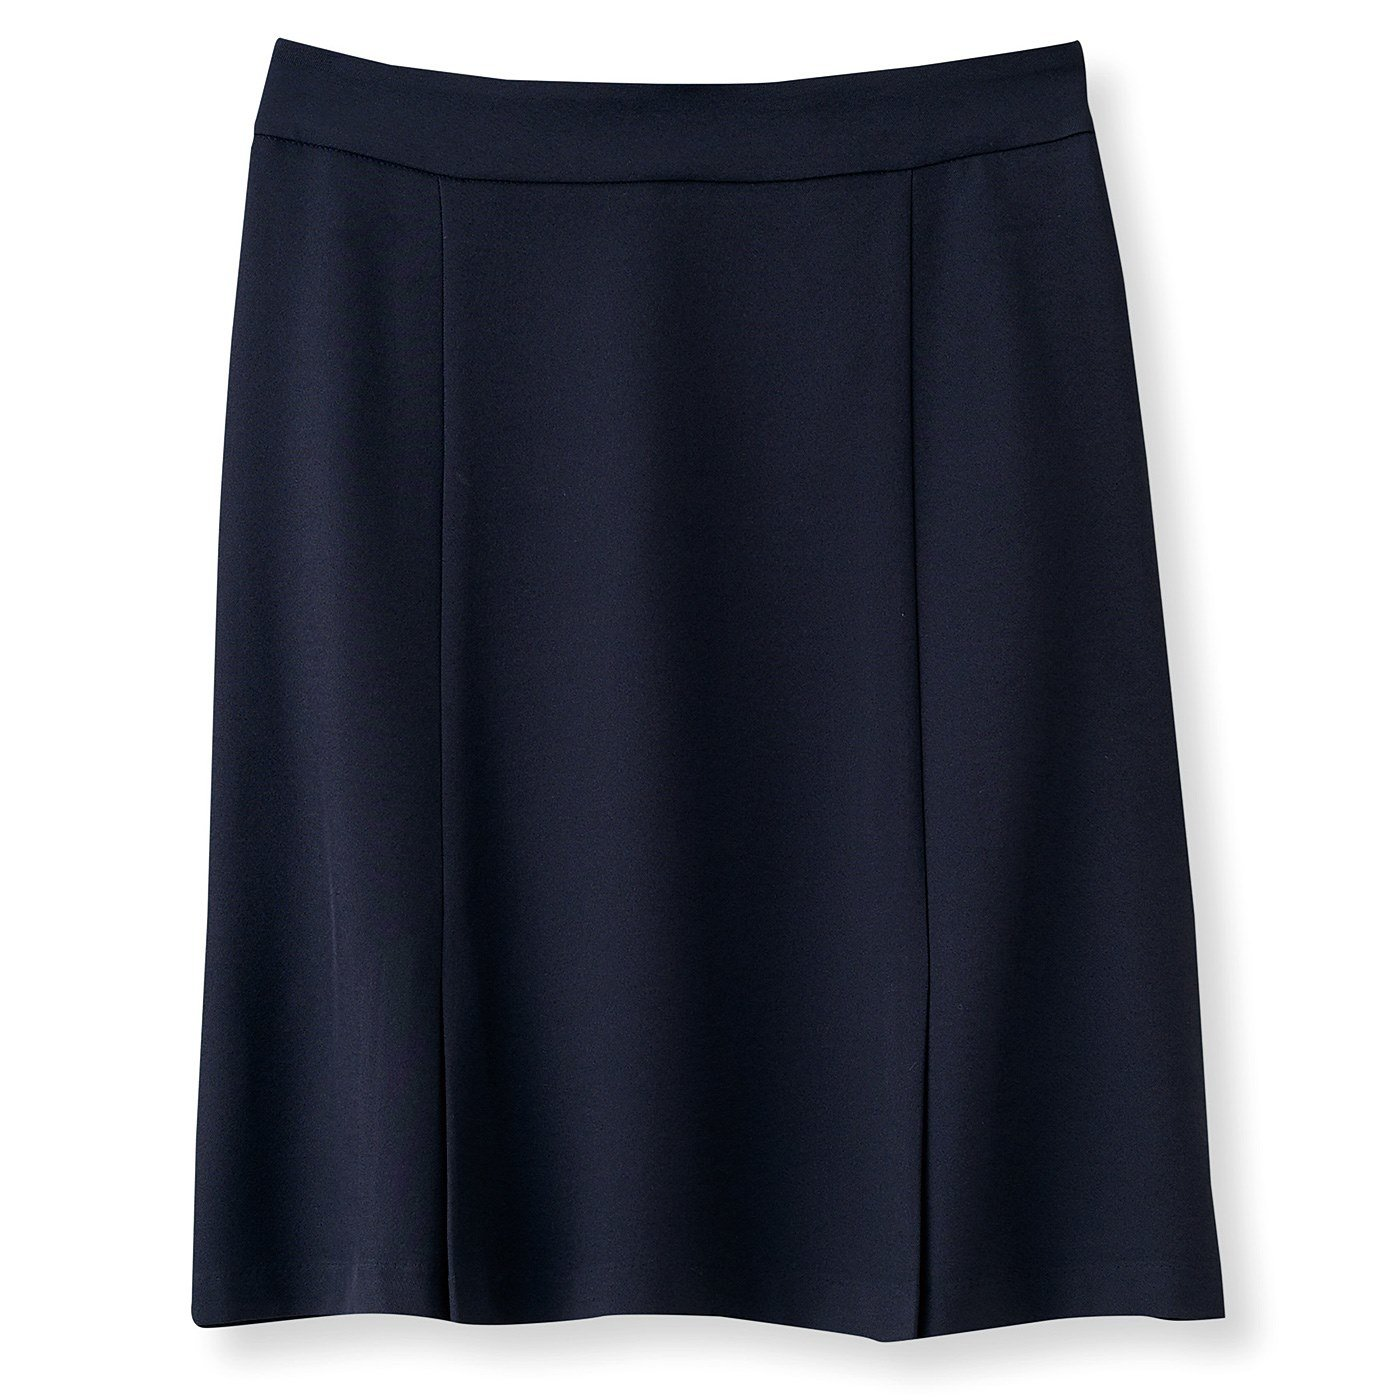 DRECOバイヤーズセレクト ドライシャーク素材の吸汗速乾ストレッチIラインスカート〈ネイビー〉